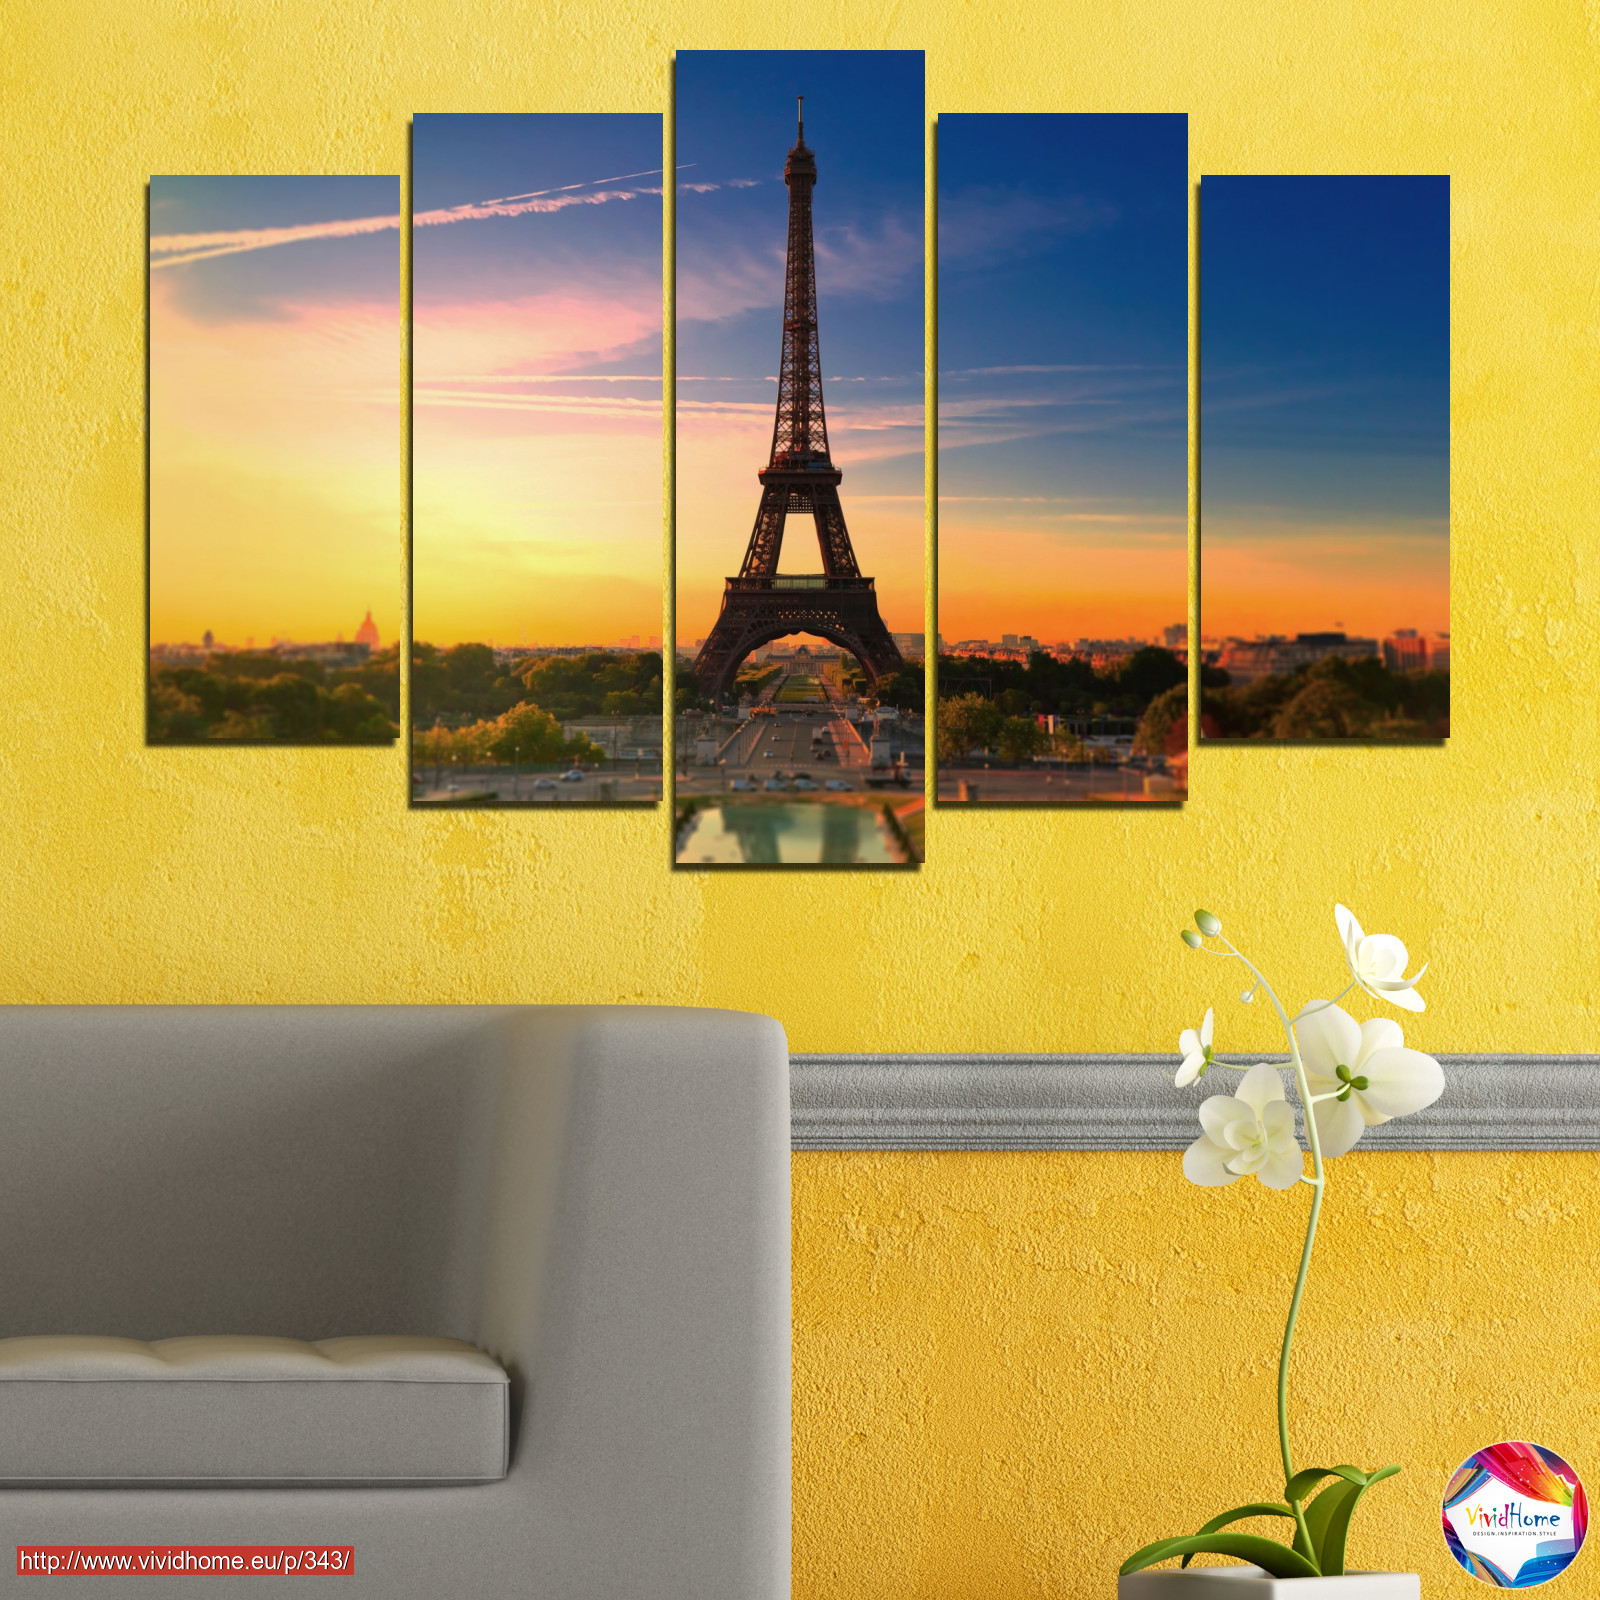 Sunset, Sky, Eiffel tower, Paris, France №0343